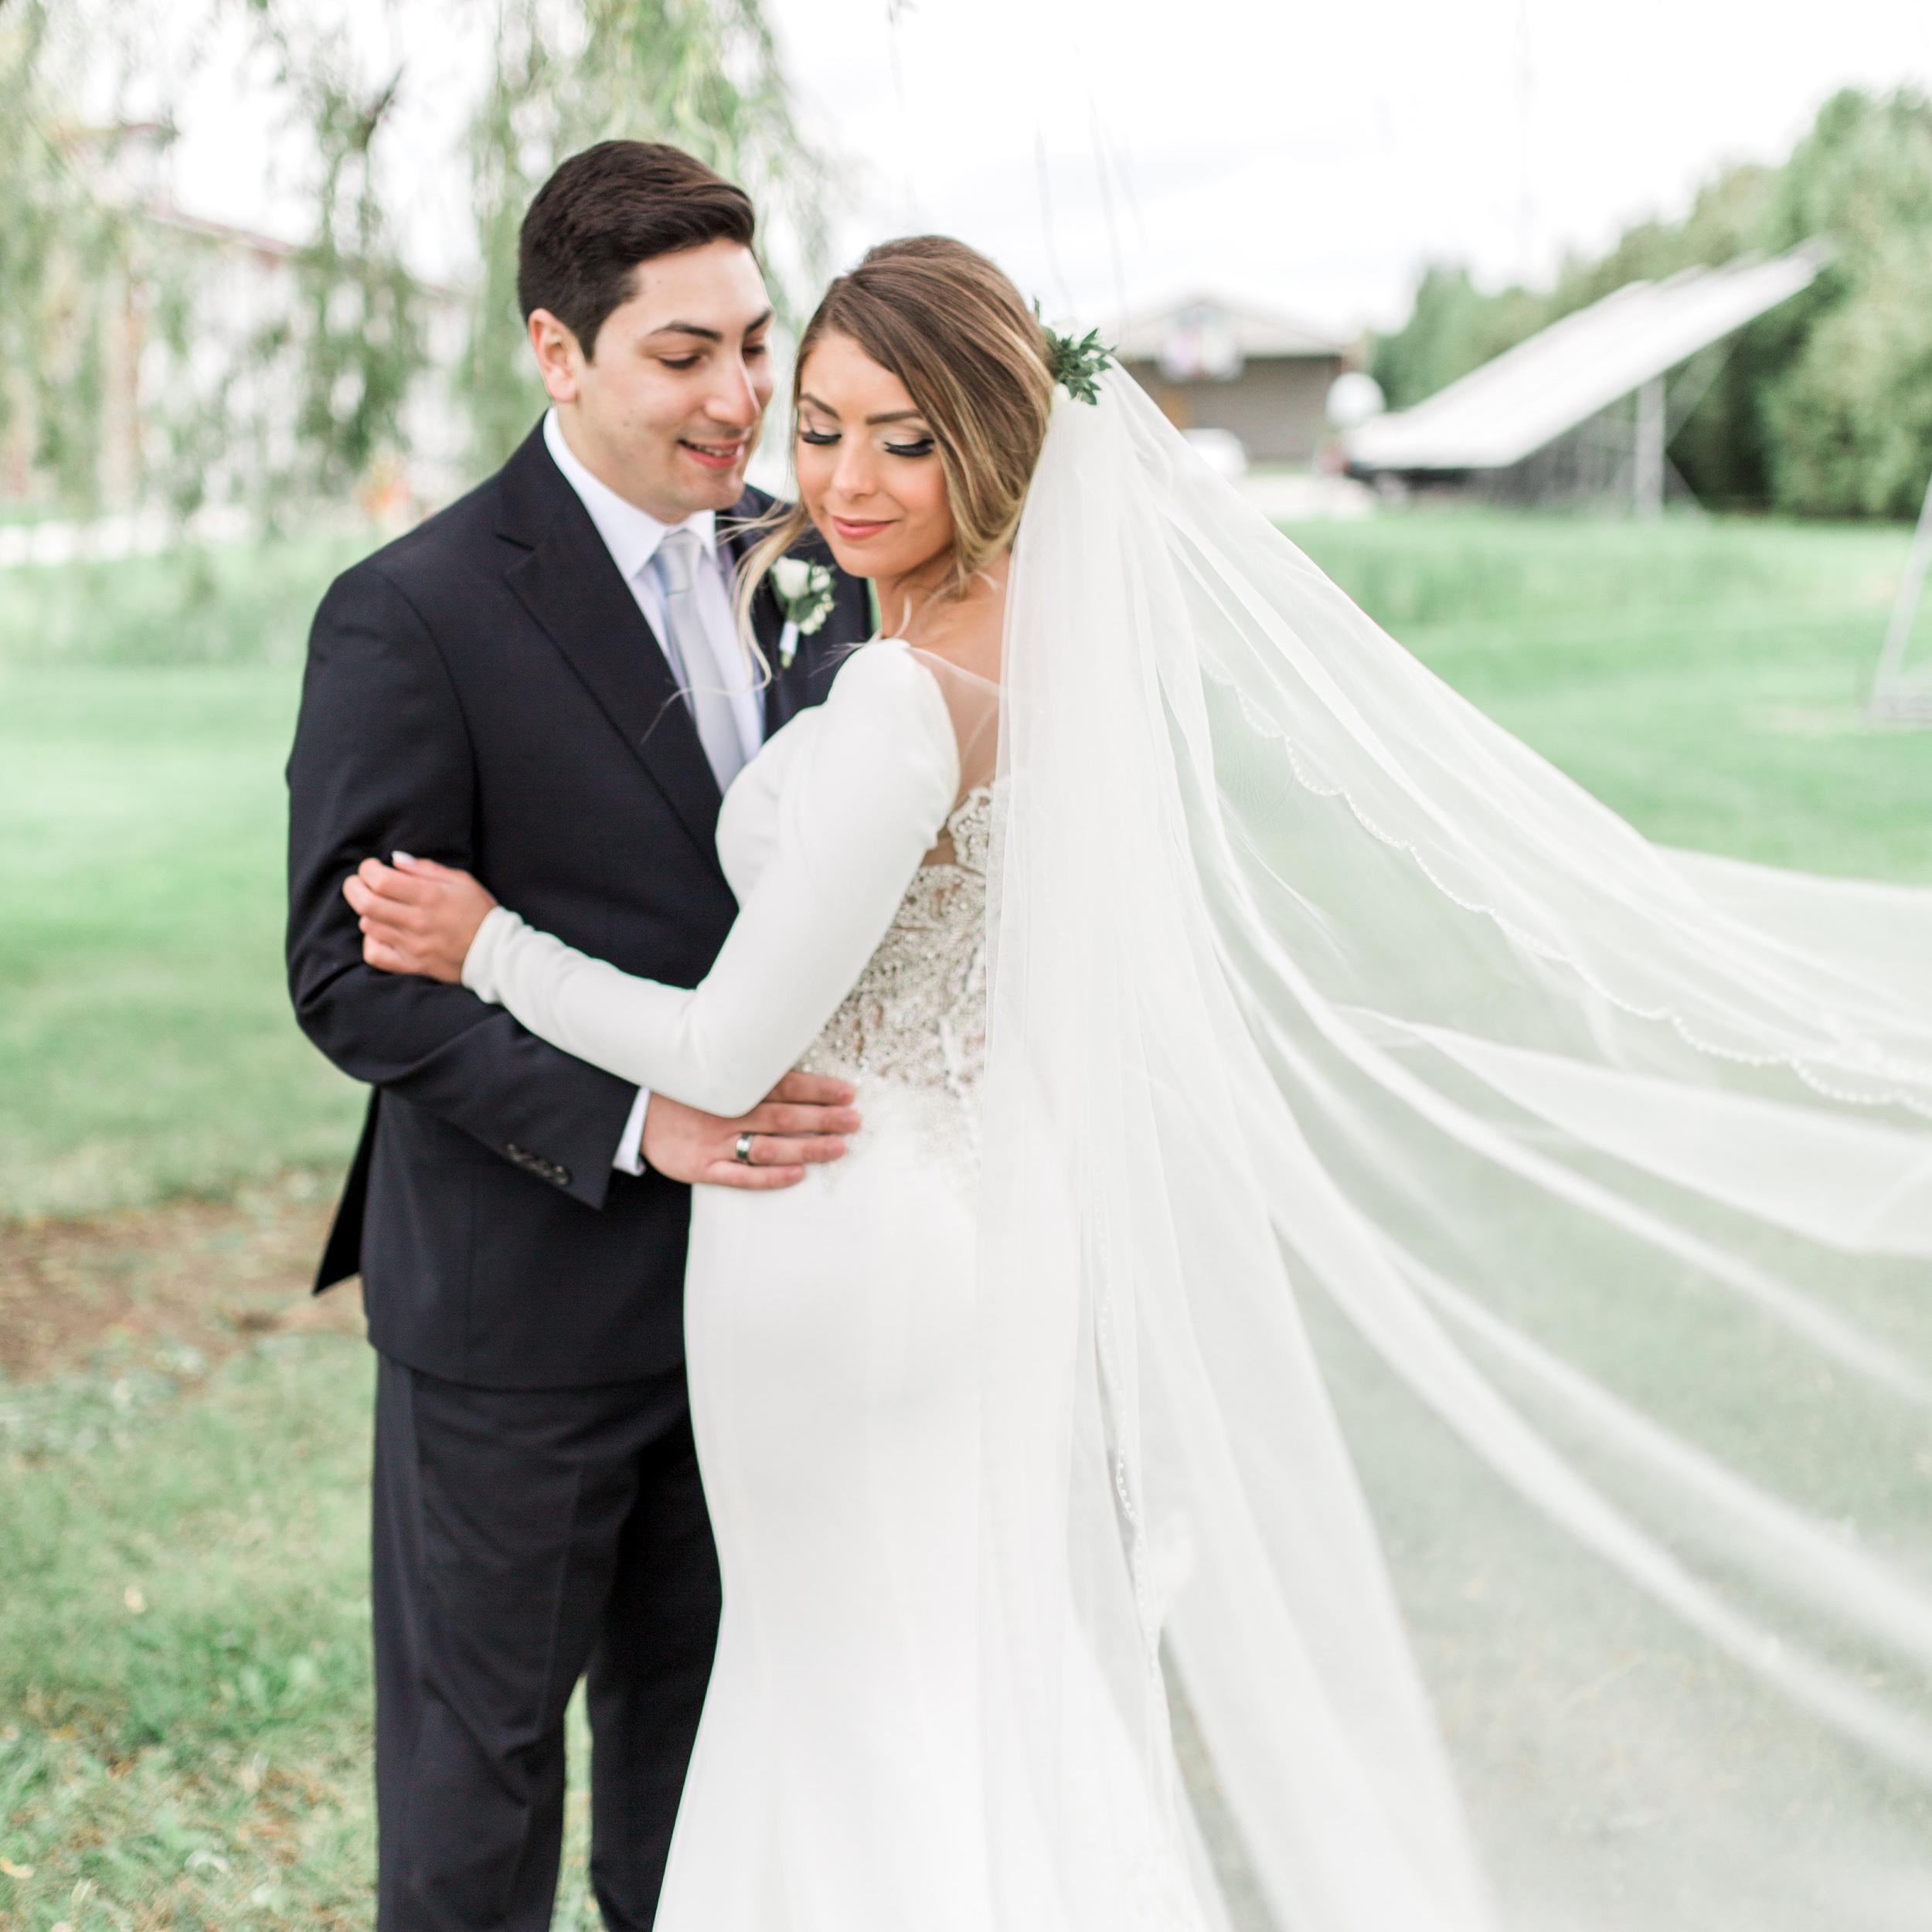 Coopers Hawk Winery Wedding